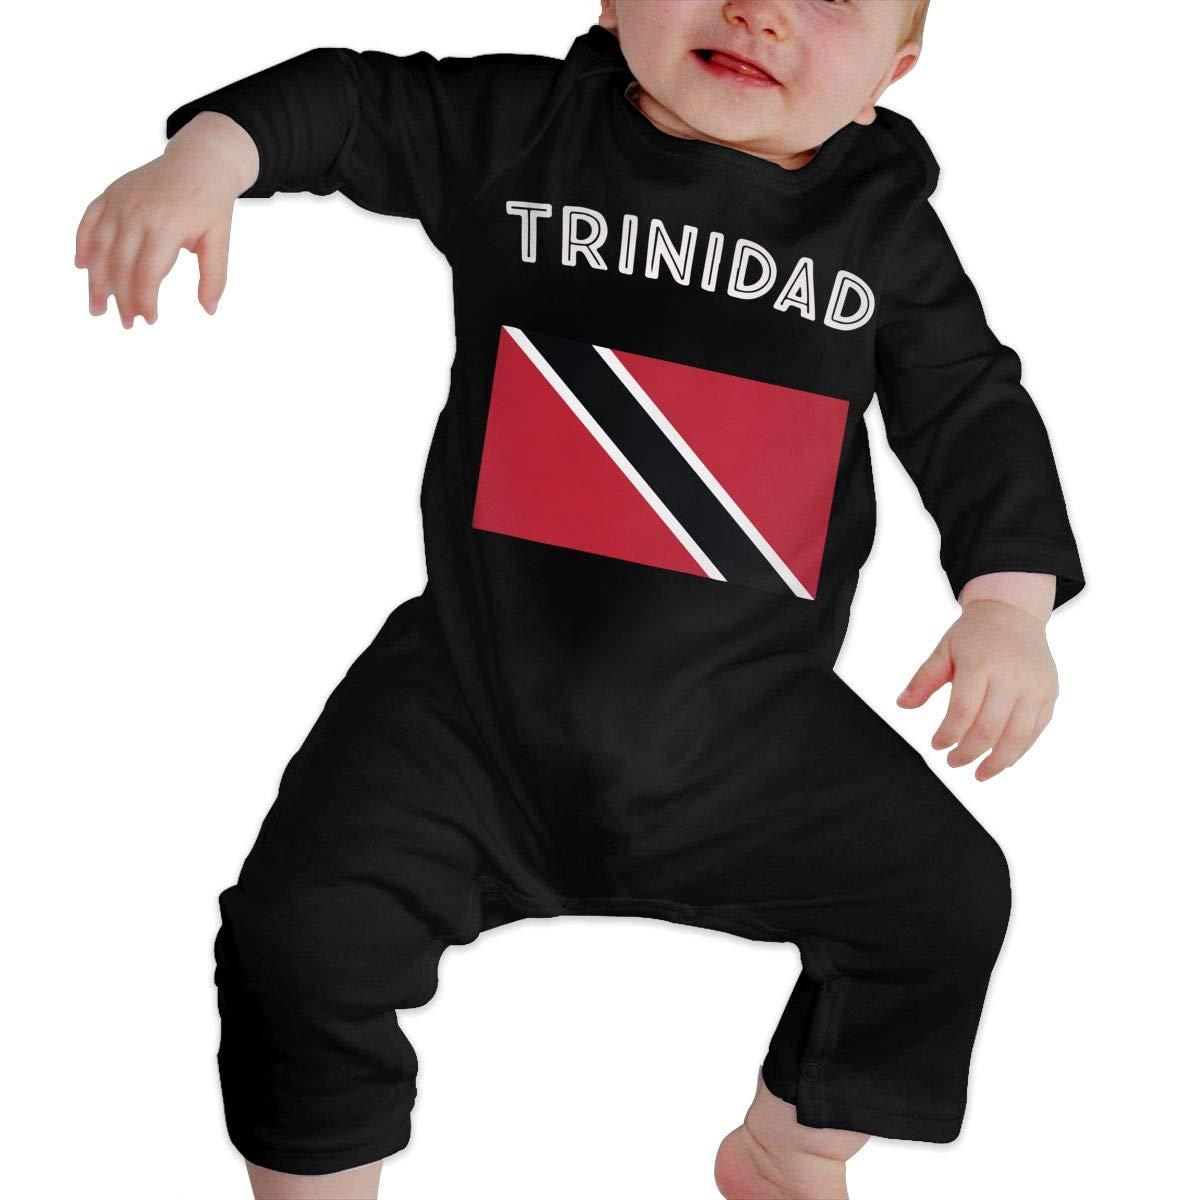 Trinidad Flag Baby Boys Organic Cotton Jumpsuit Overall Romper